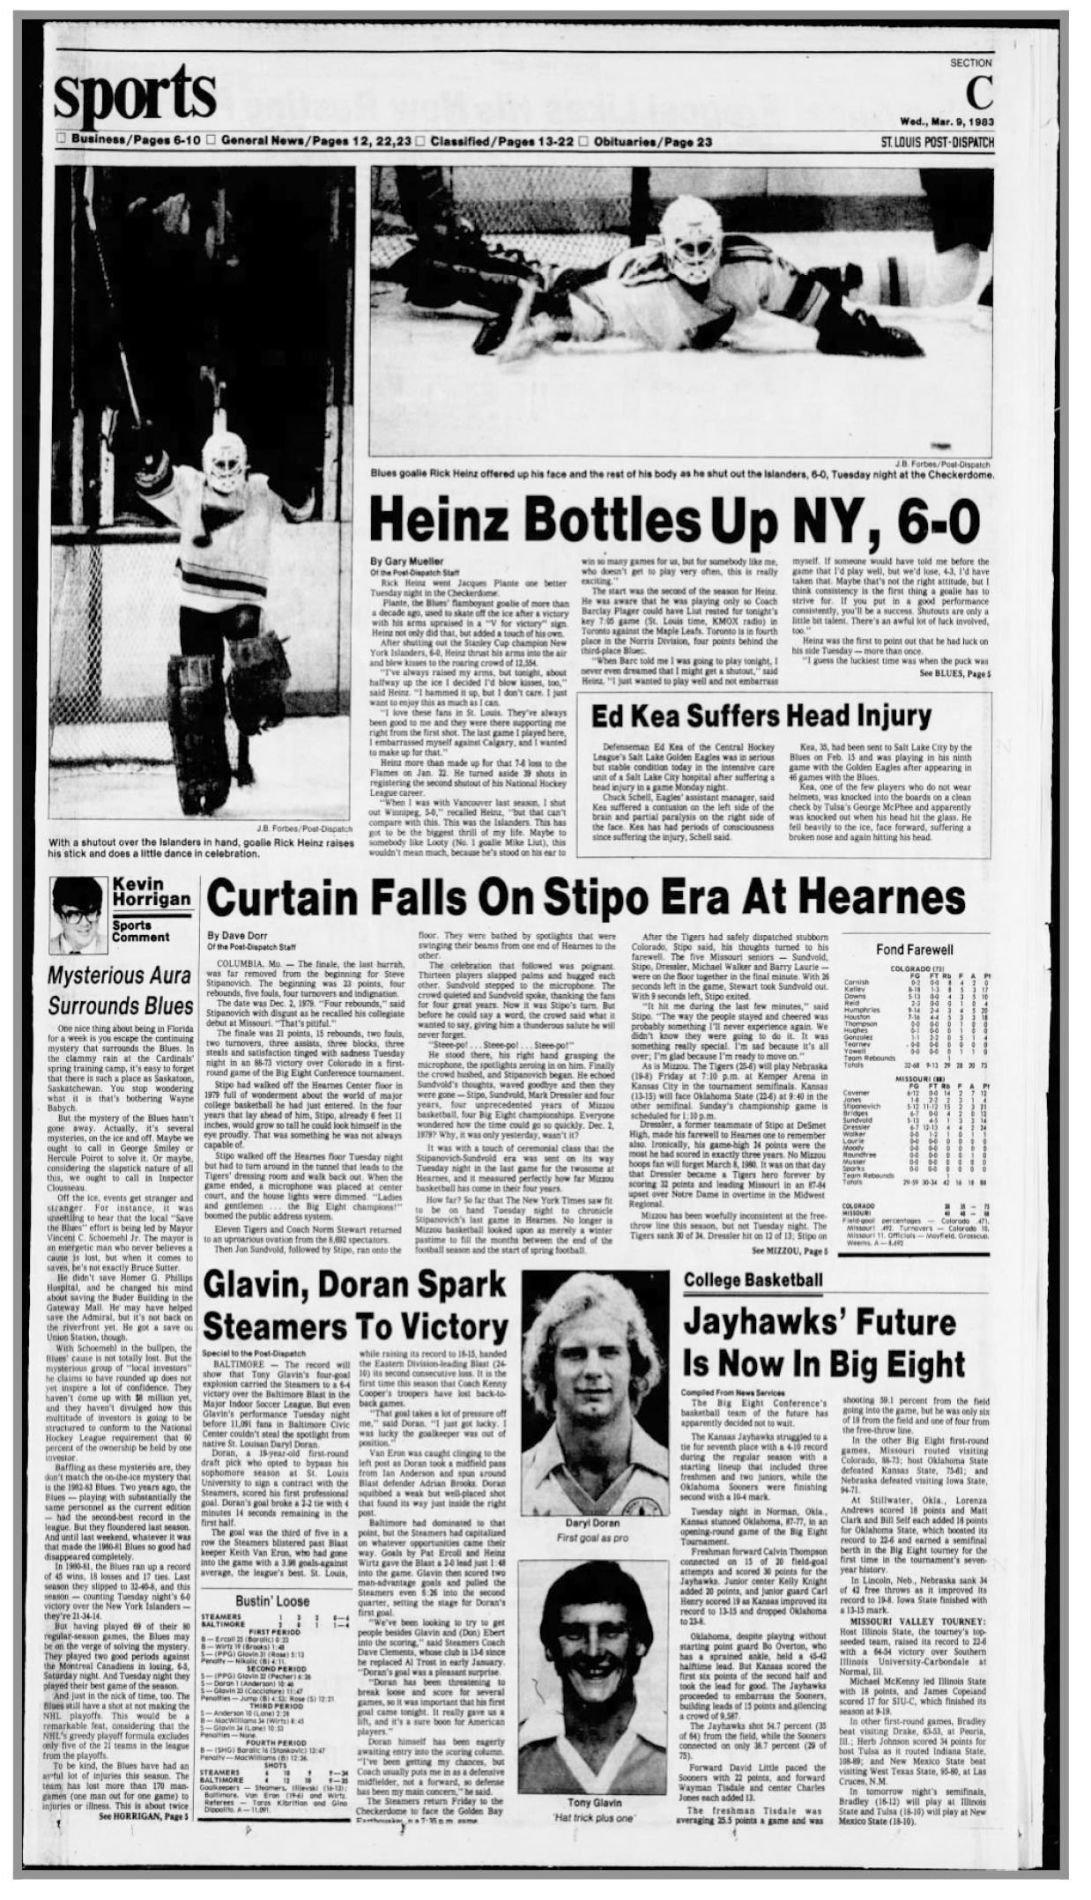 St__Louis_Post_Dispatch_Wed__Mar_9__1983_